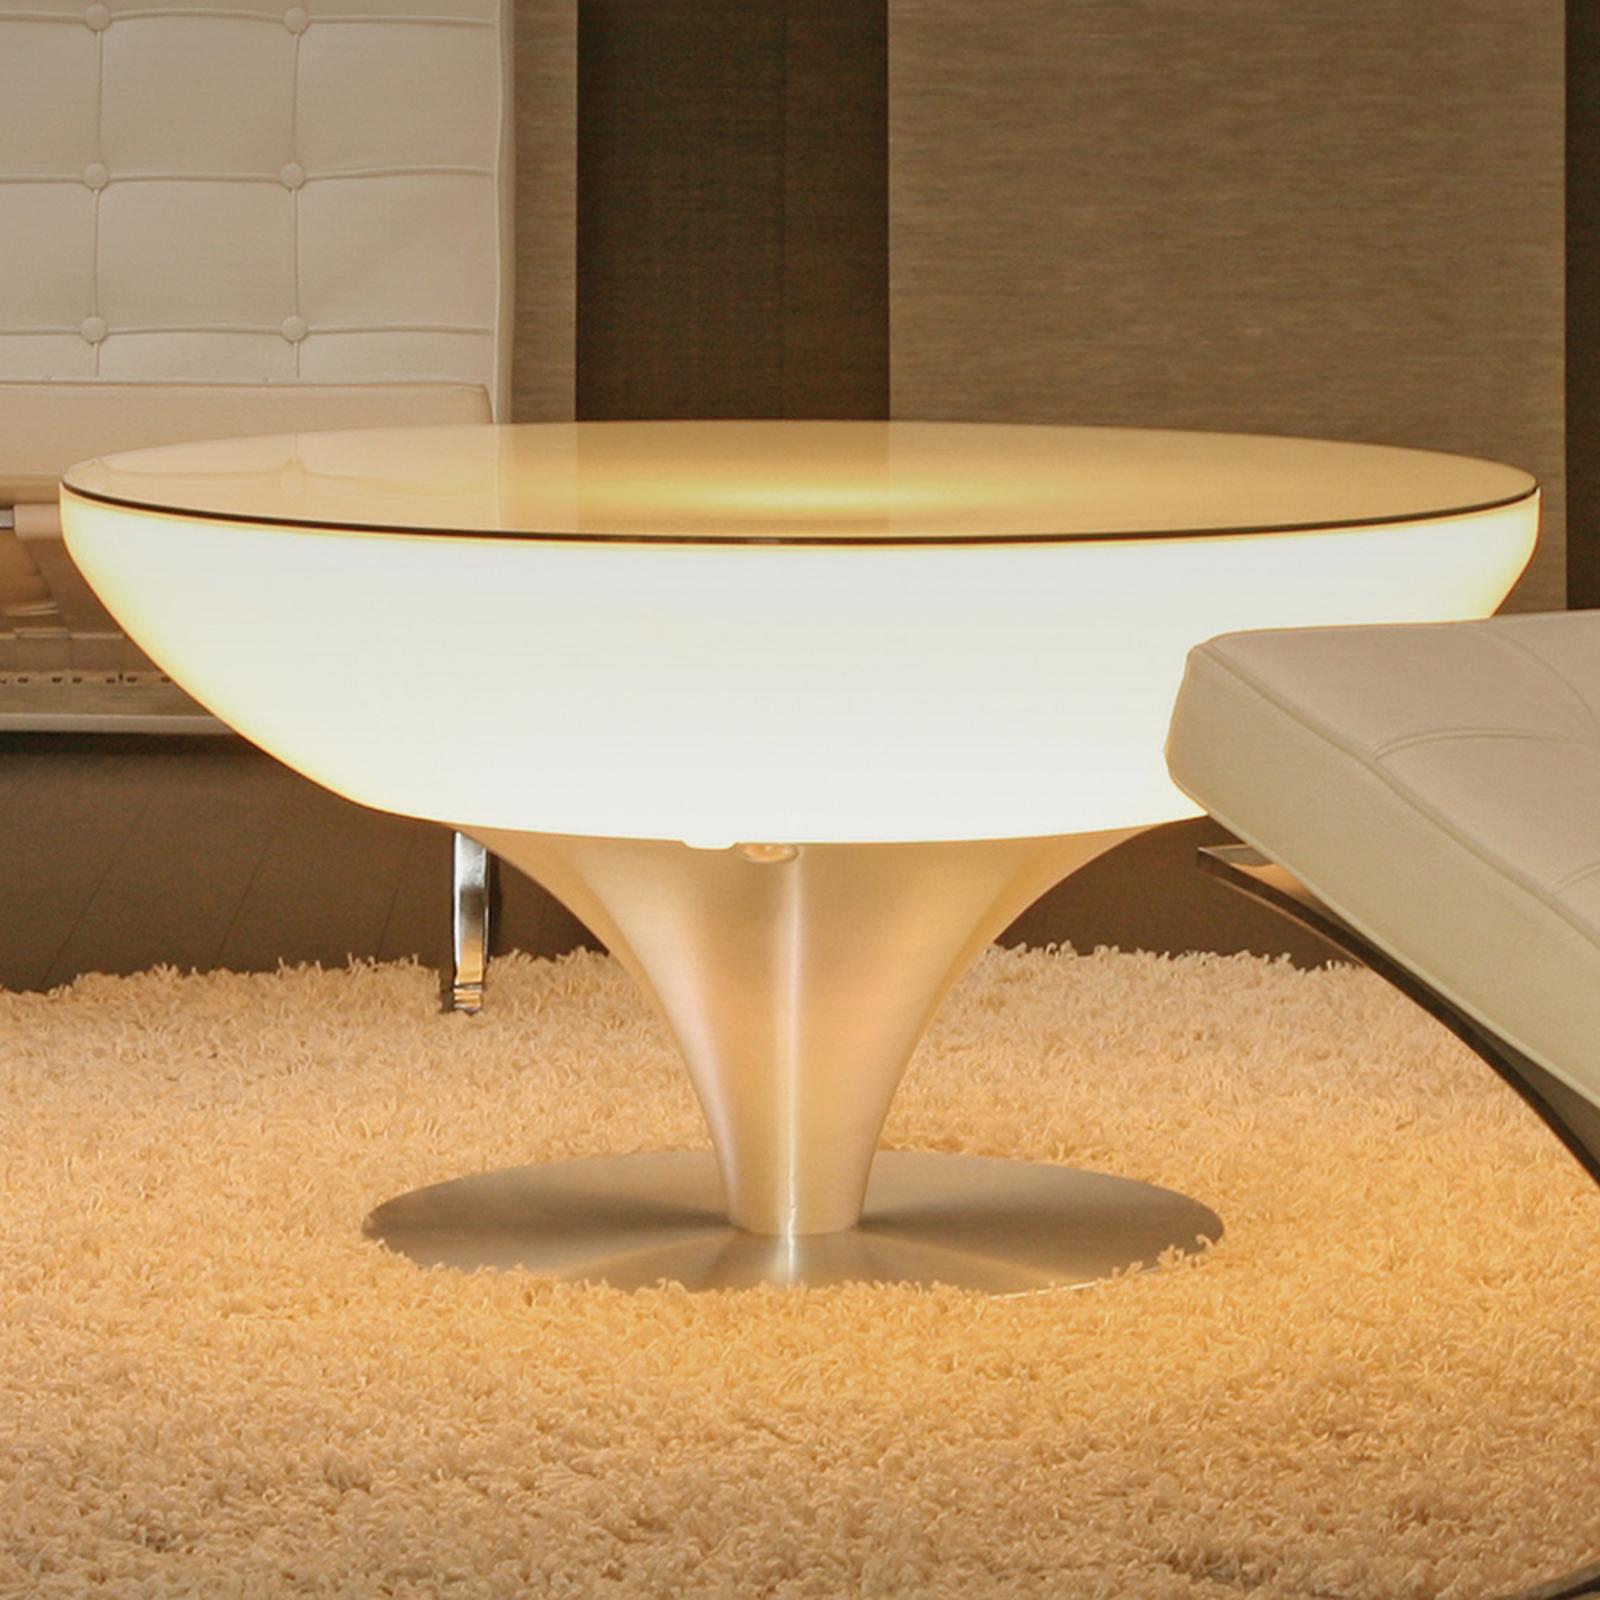 Leuchttisch Lounge Table LED Pro H 45 cm